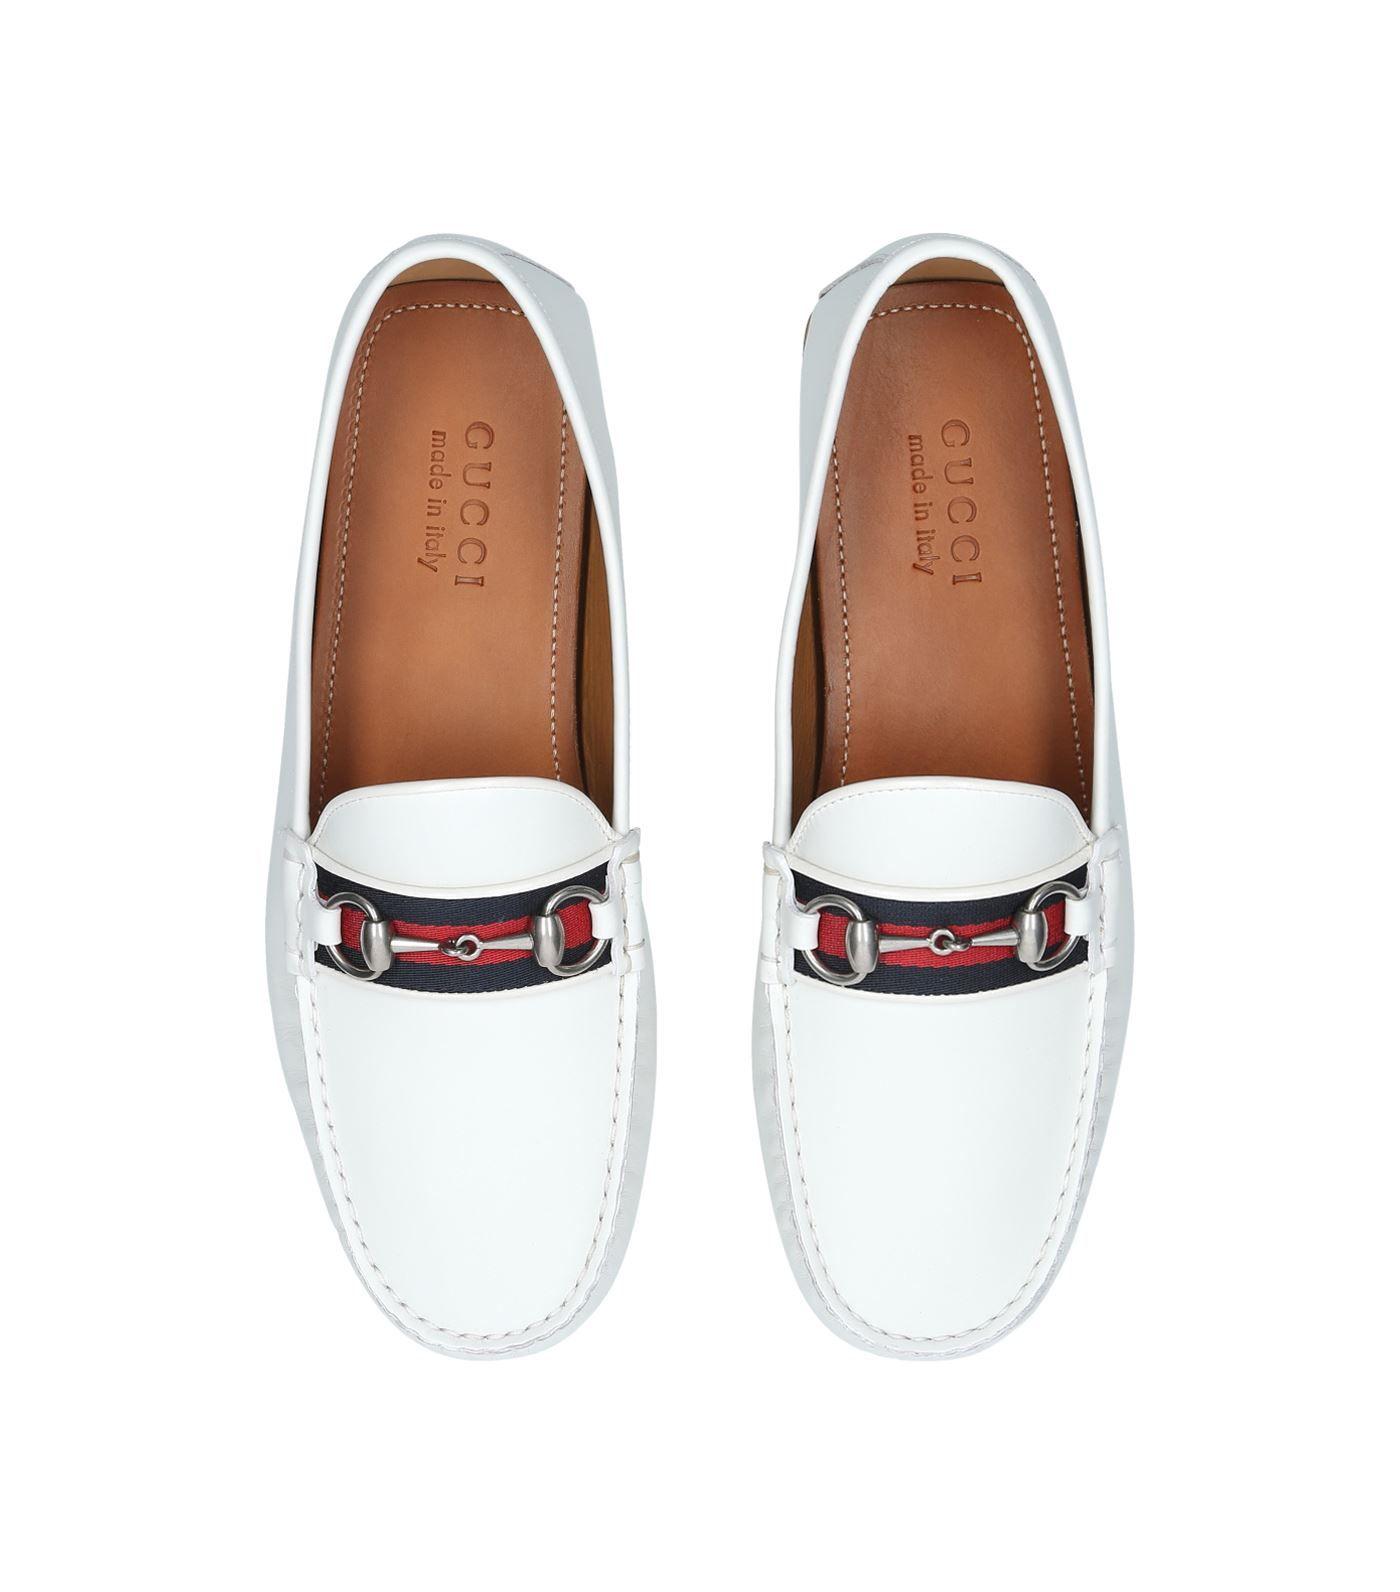 1b9dc3e12 Gucci Kanye Leather Driving Shoes #AD , #spon, #Kanye, #Gucci